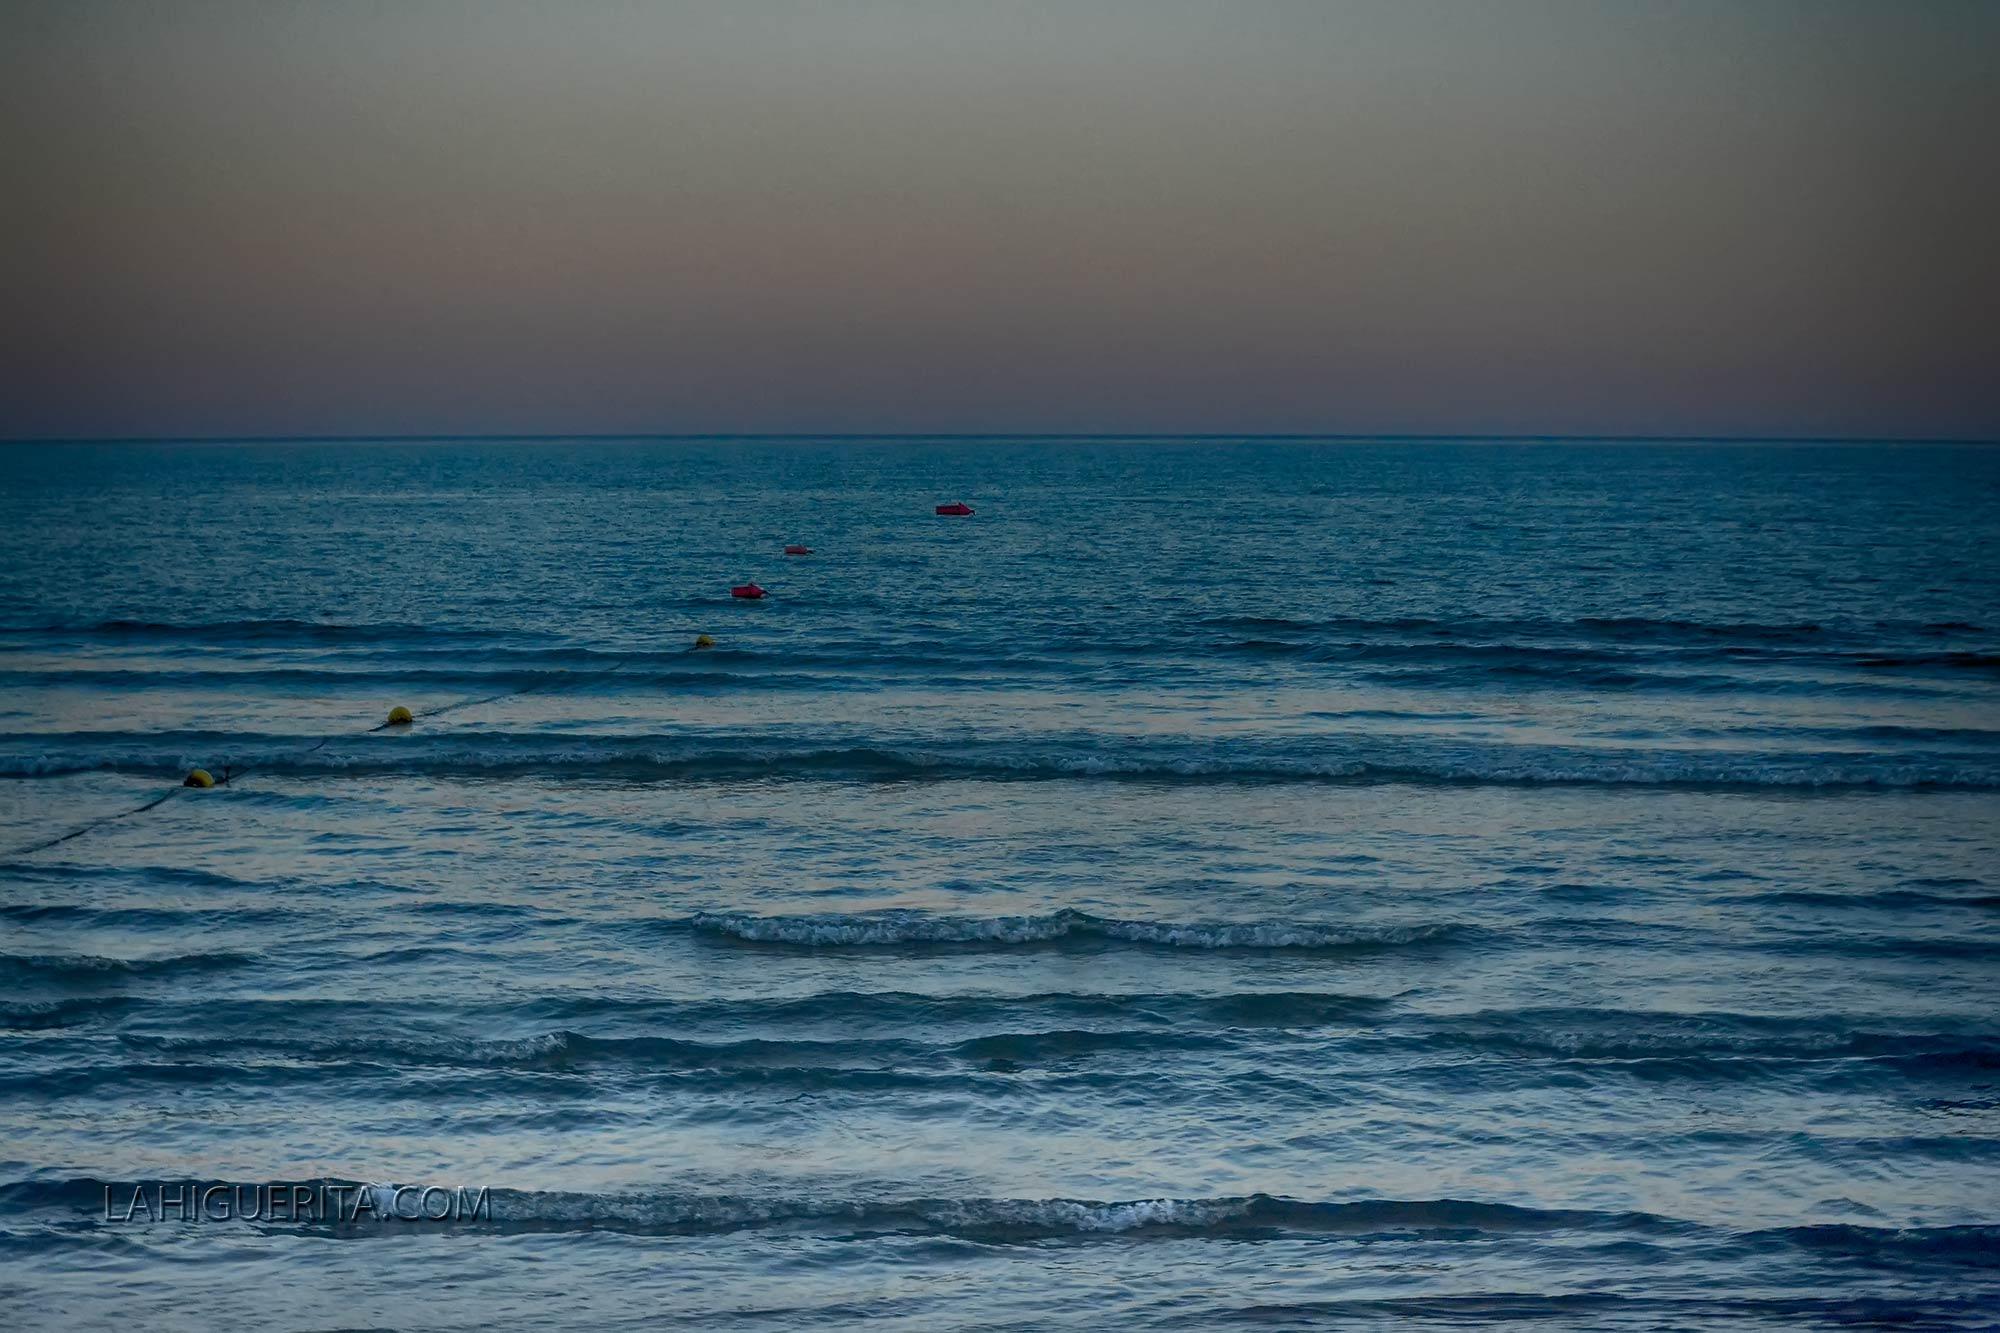 Julio registró la temperatura más alta del agua de baño en Isla Cristina